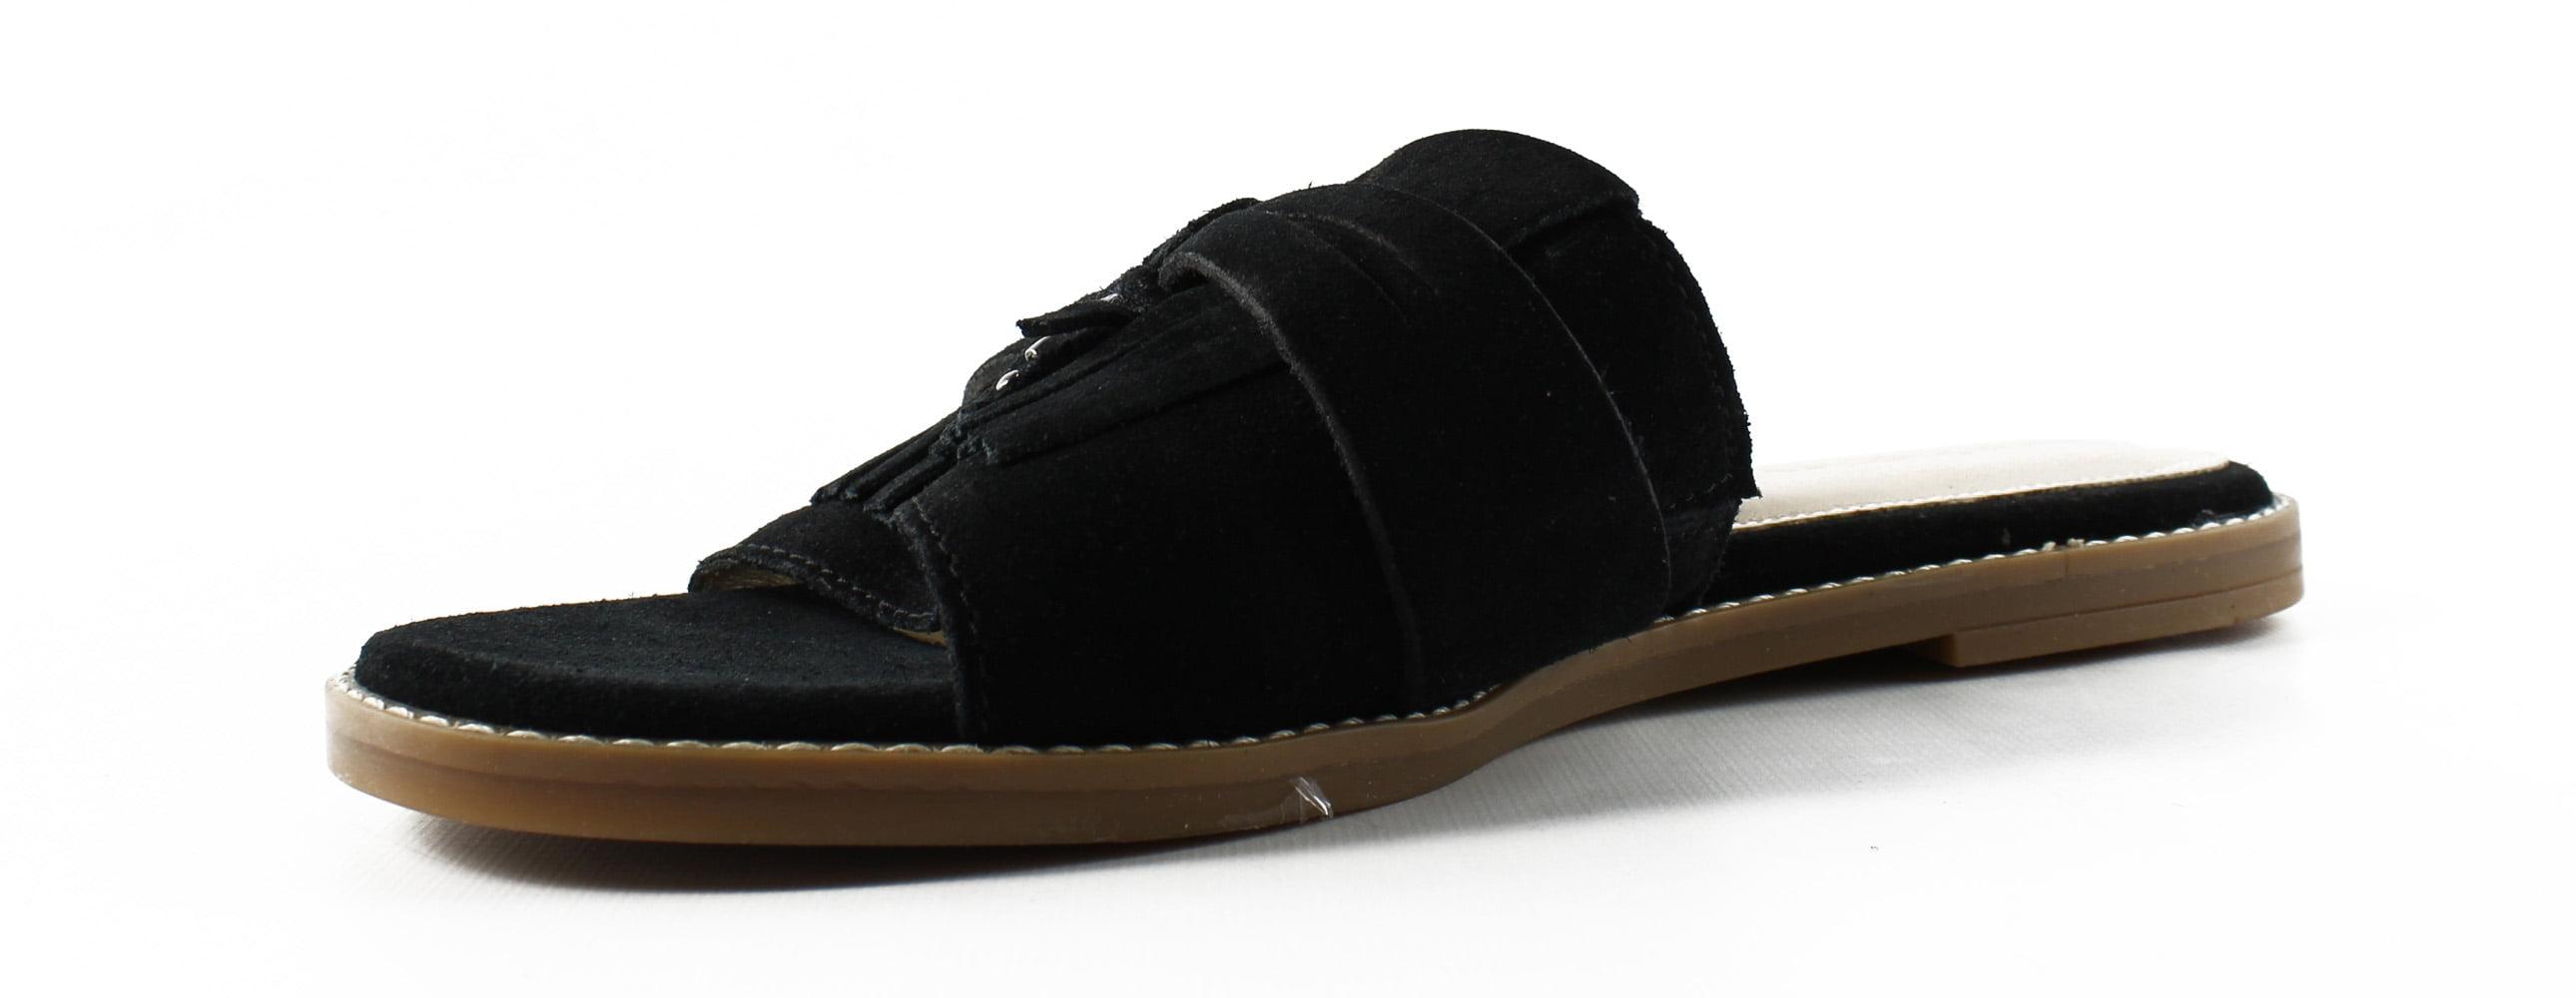 New HushPuppies Size Womens Hw06108-002 Black Slides Size HushPuppies 9.5 4edaf8